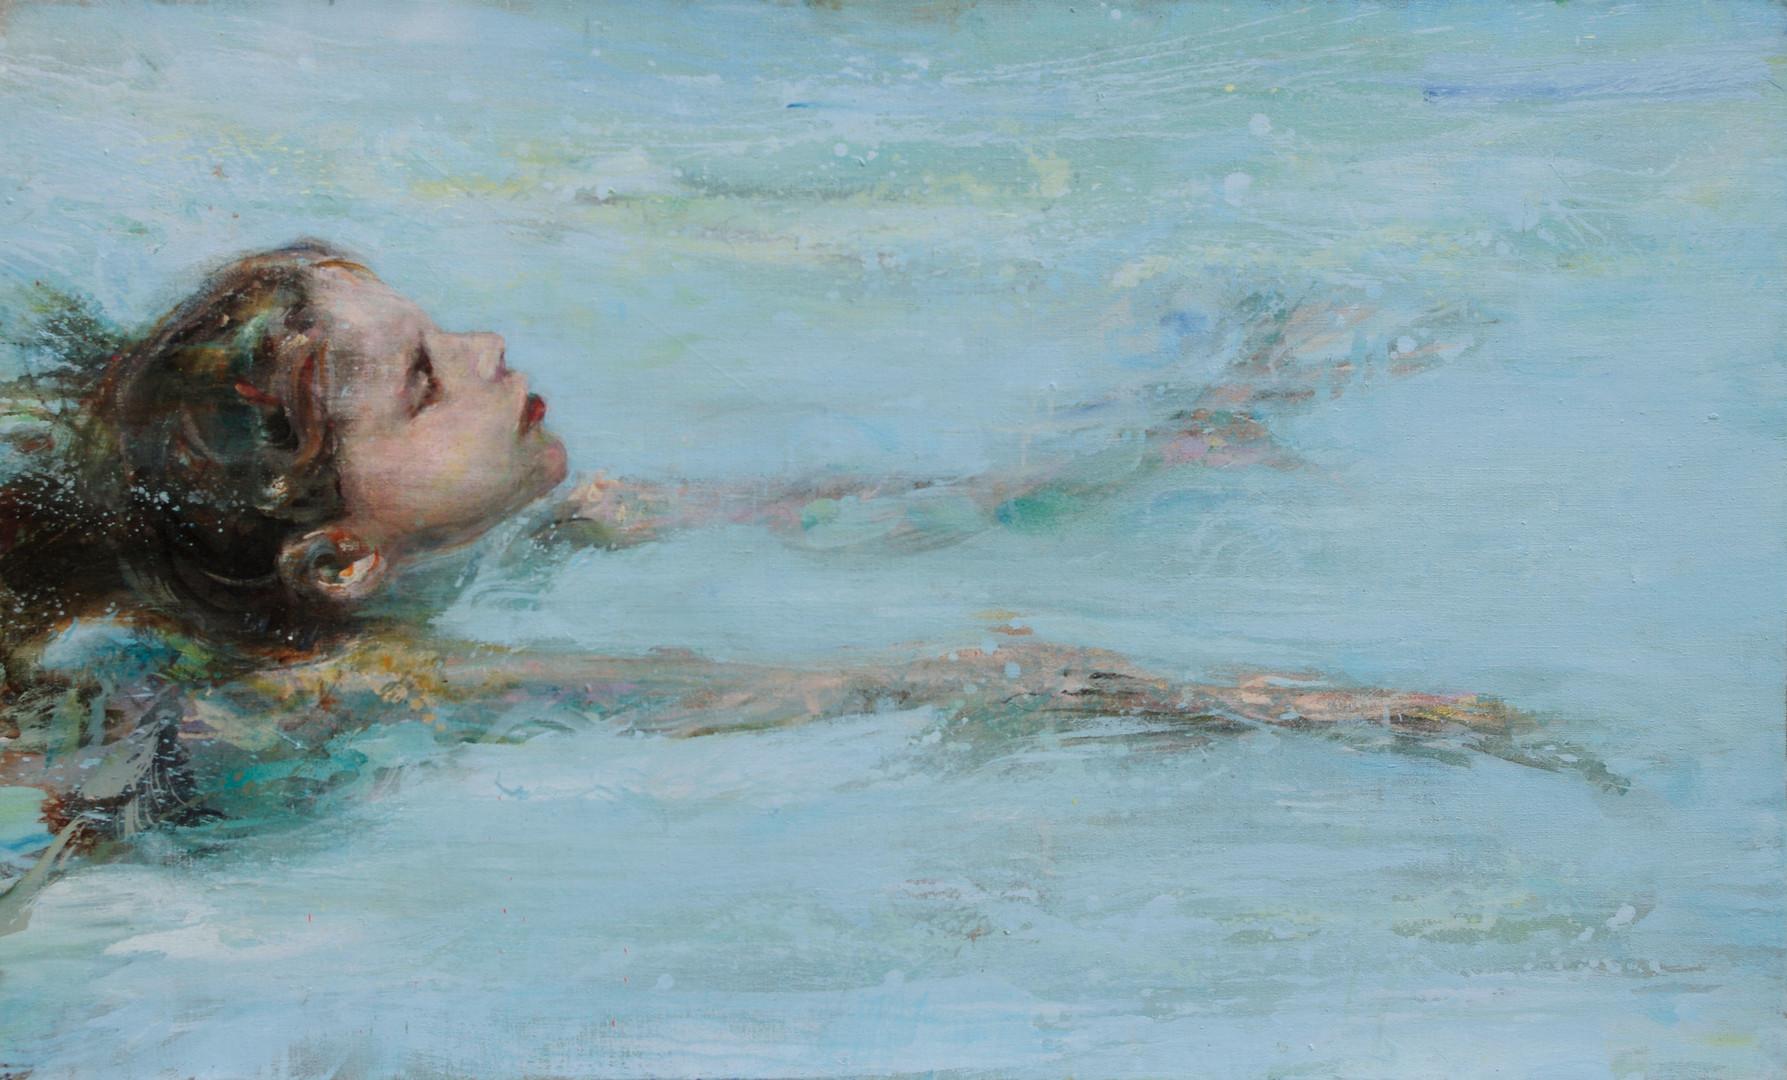 La brasse,127 x 77 cm